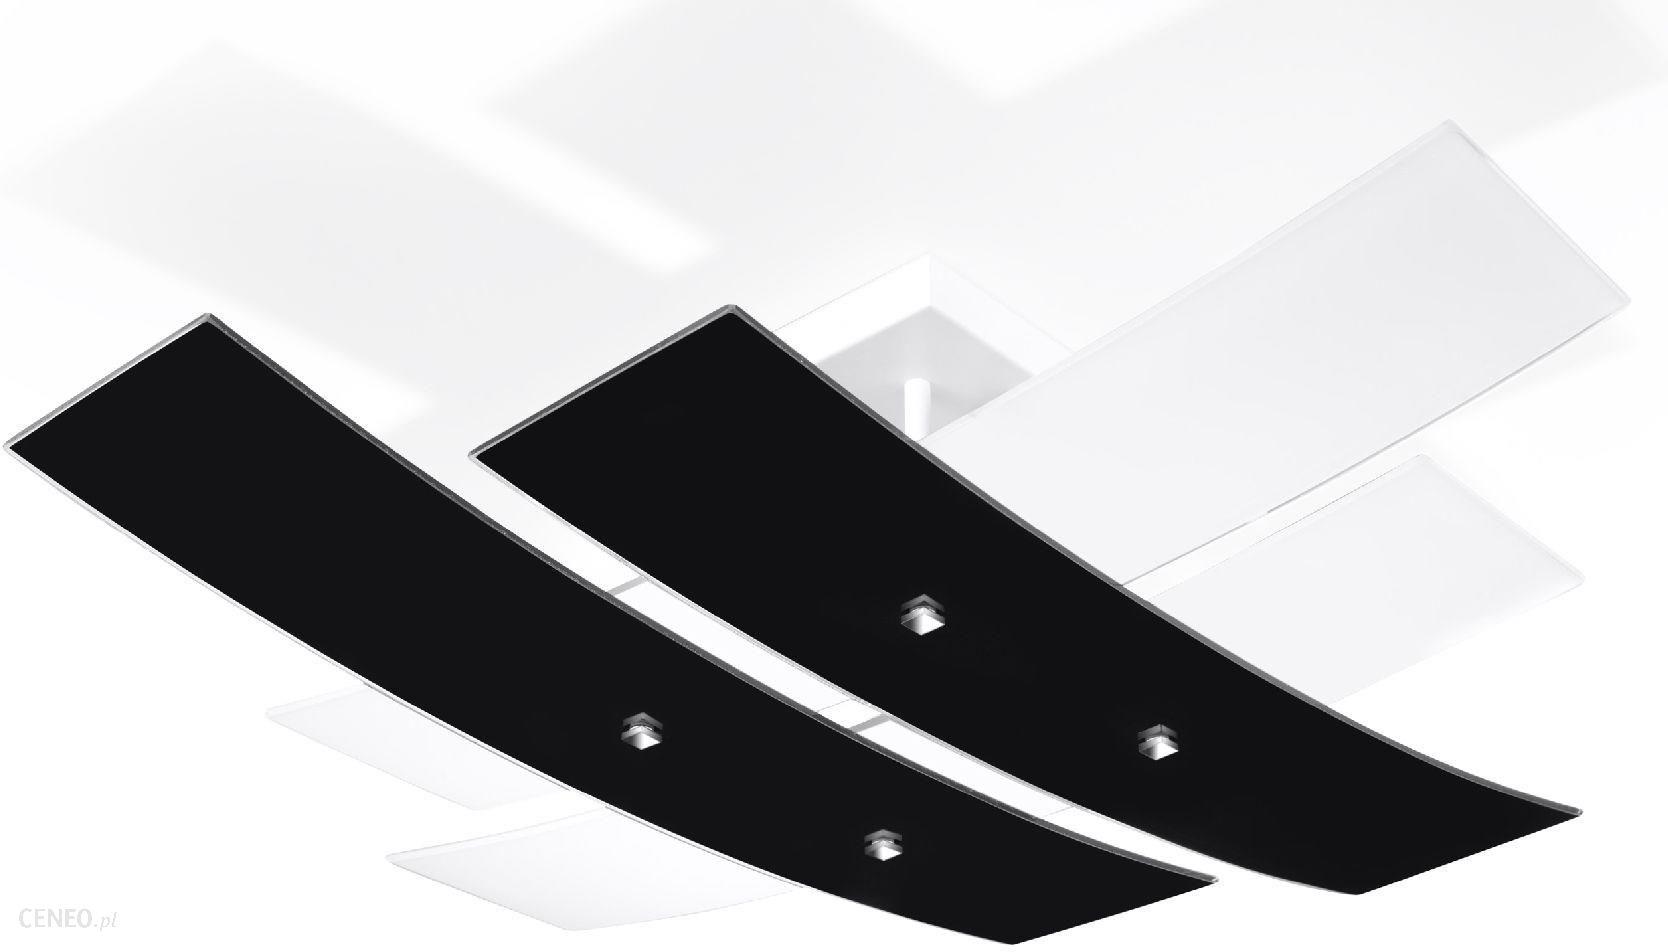 lampa sufitowa 4 p omienna ze szklan tafl szk a elementy metalowe wyko czone w kolorze. Black Bedroom Furniture Sets. Home Design Ideas